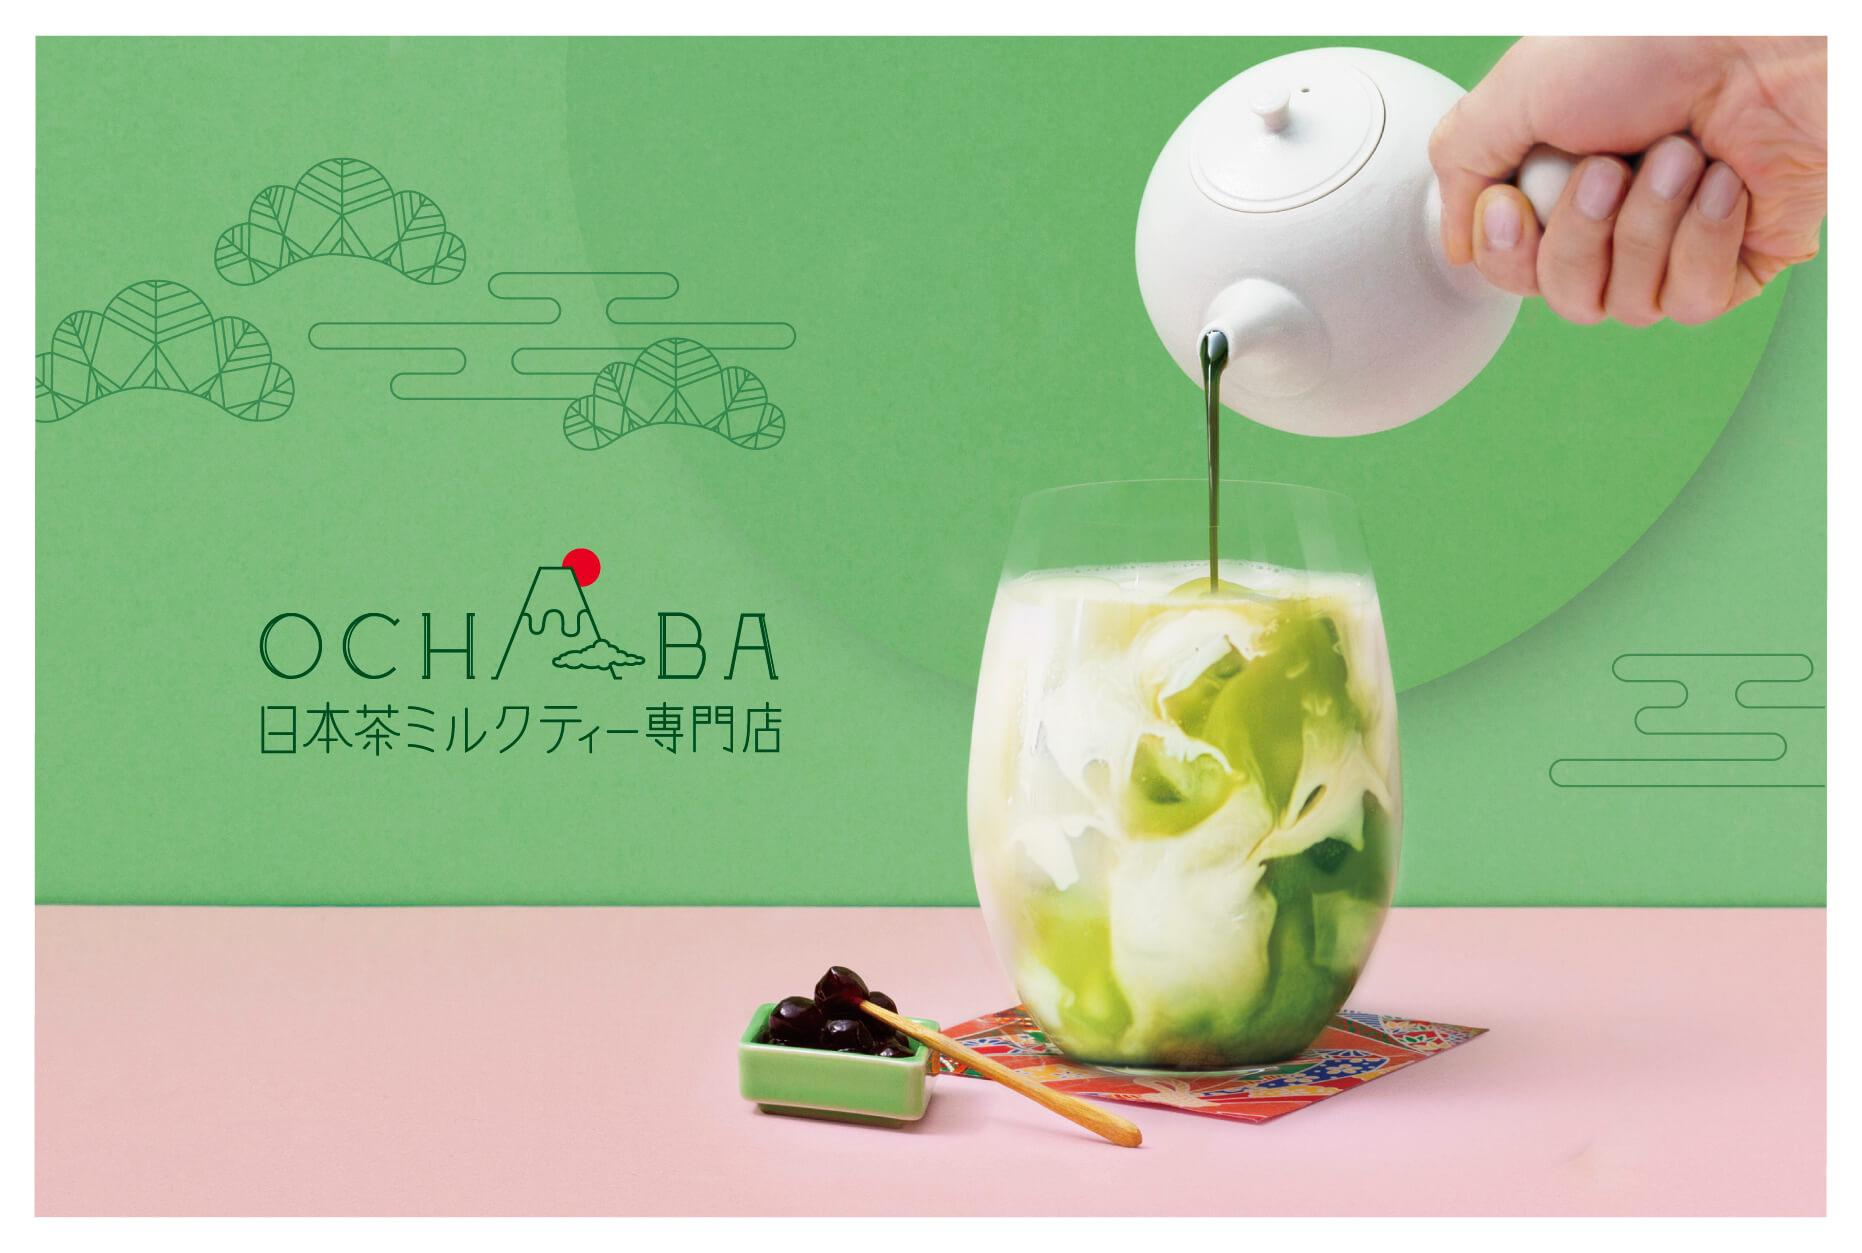 OCHABA_キービジュアル_key_visual